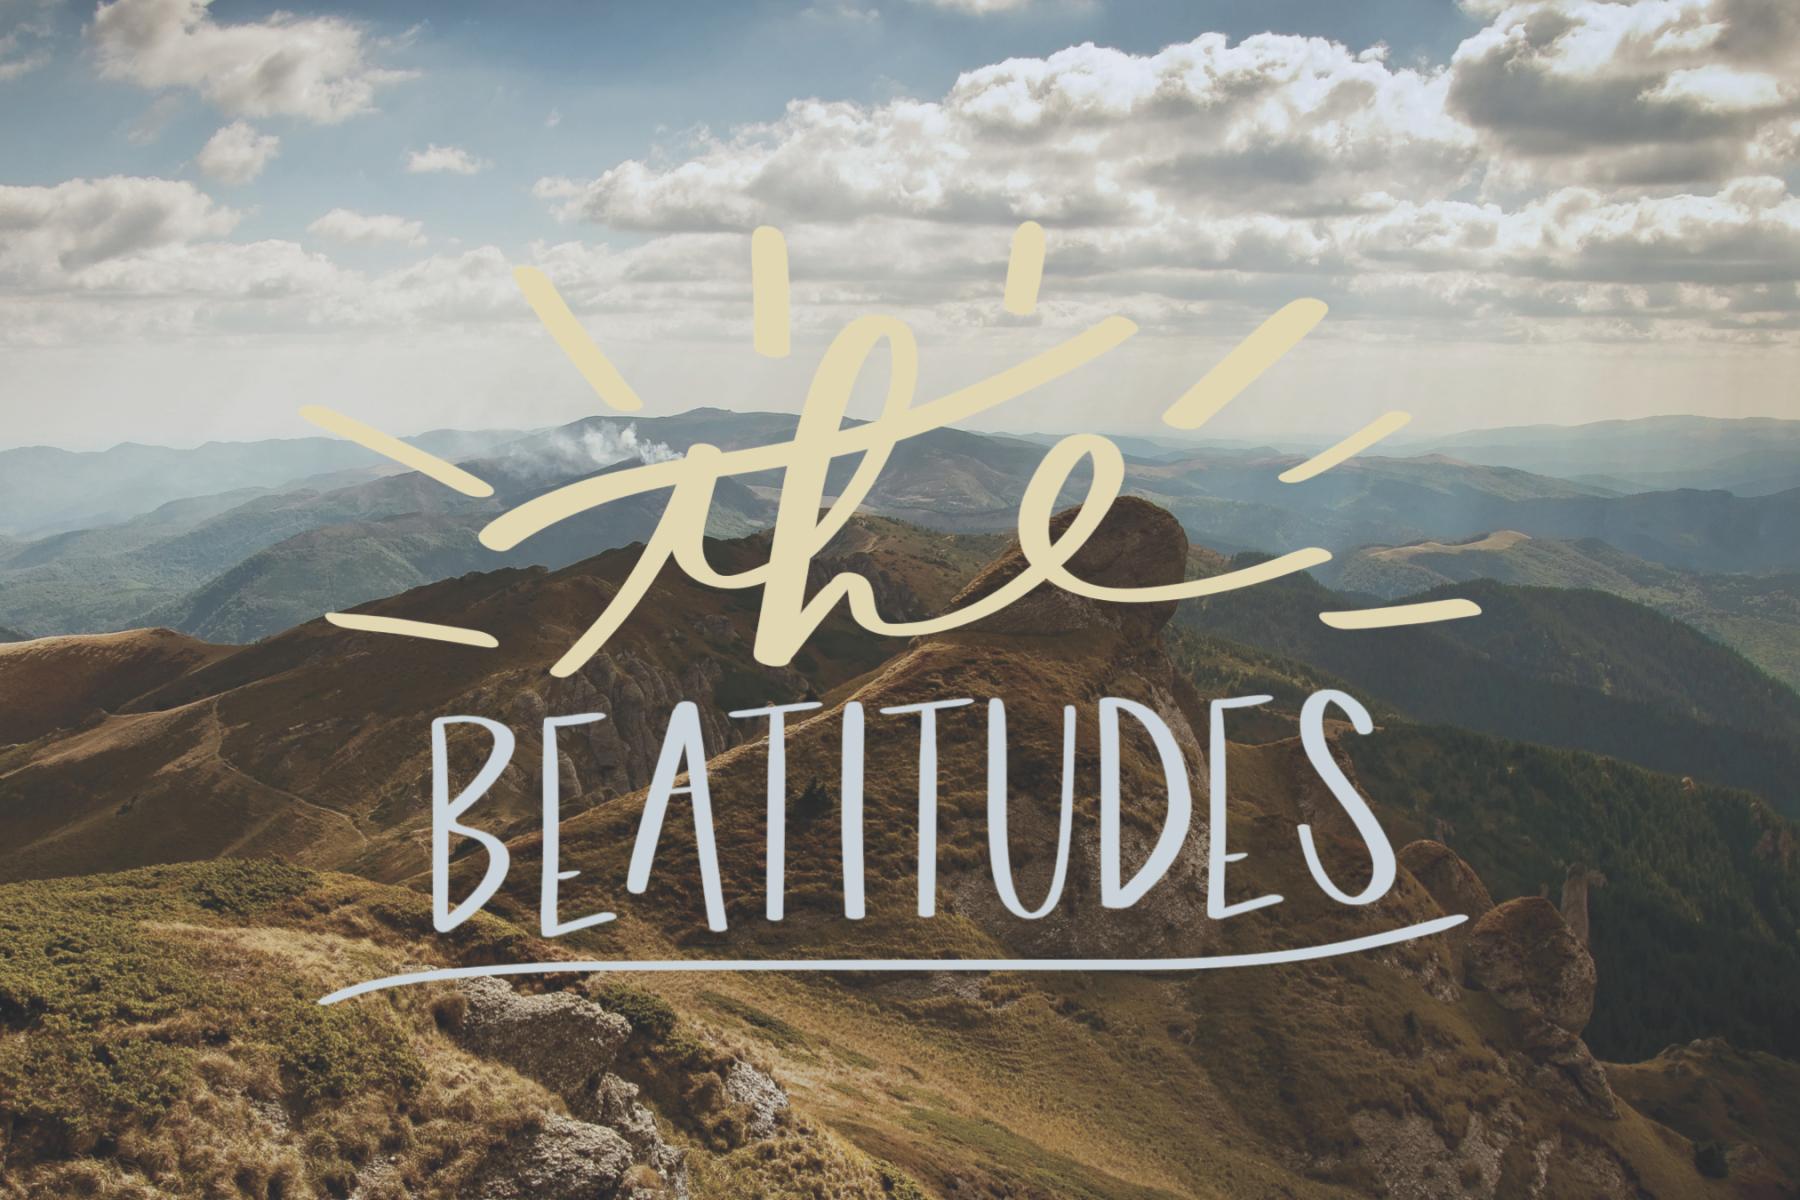 the beatitudes The beatitudes in the gospel of matthew [] μακάριοι οἱ πτωχοὶ τῷ πνεύματι, ὅτι αὐτῶν ἐστιν ἡ βασιλεία τῶν οὐρανῶν.